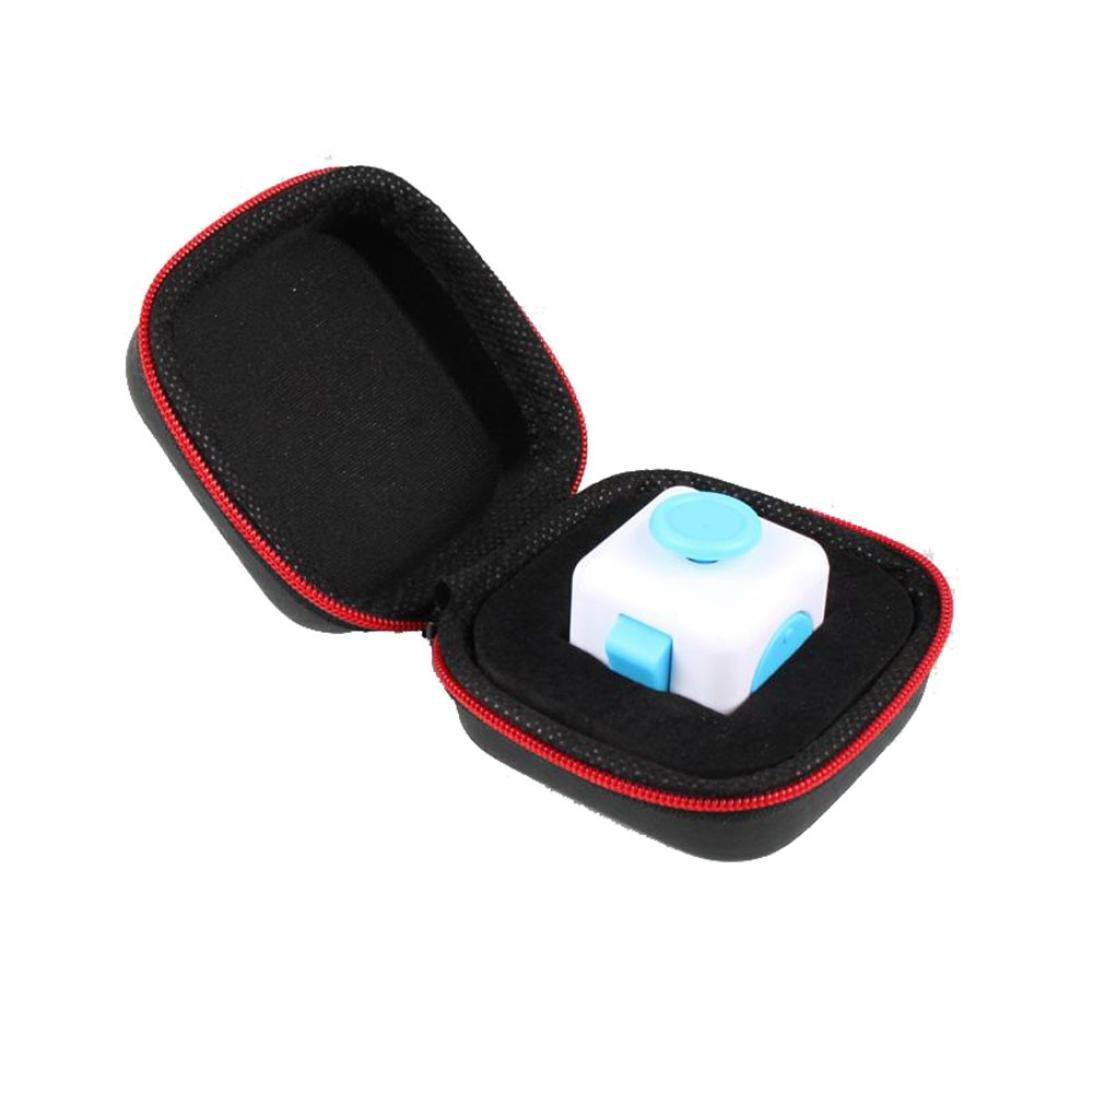 Fulltime®Fidget Cube Anxiété Stress Relief Focus Dice Bag Box Carry Case Packet Fulltime® toys11